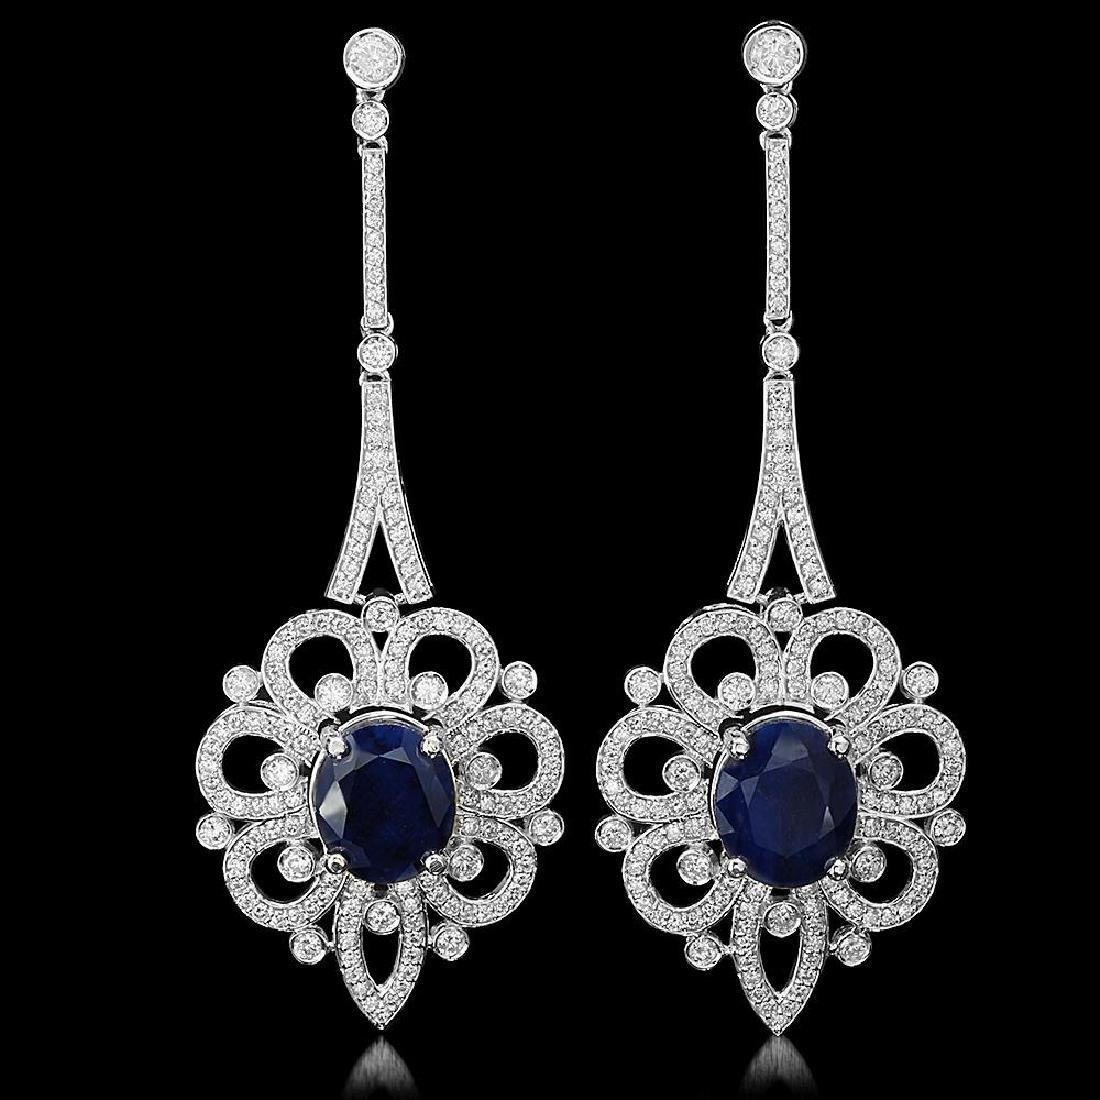 18K Gold 13.64ct Sapphire 4.08ct Diamond Earrings